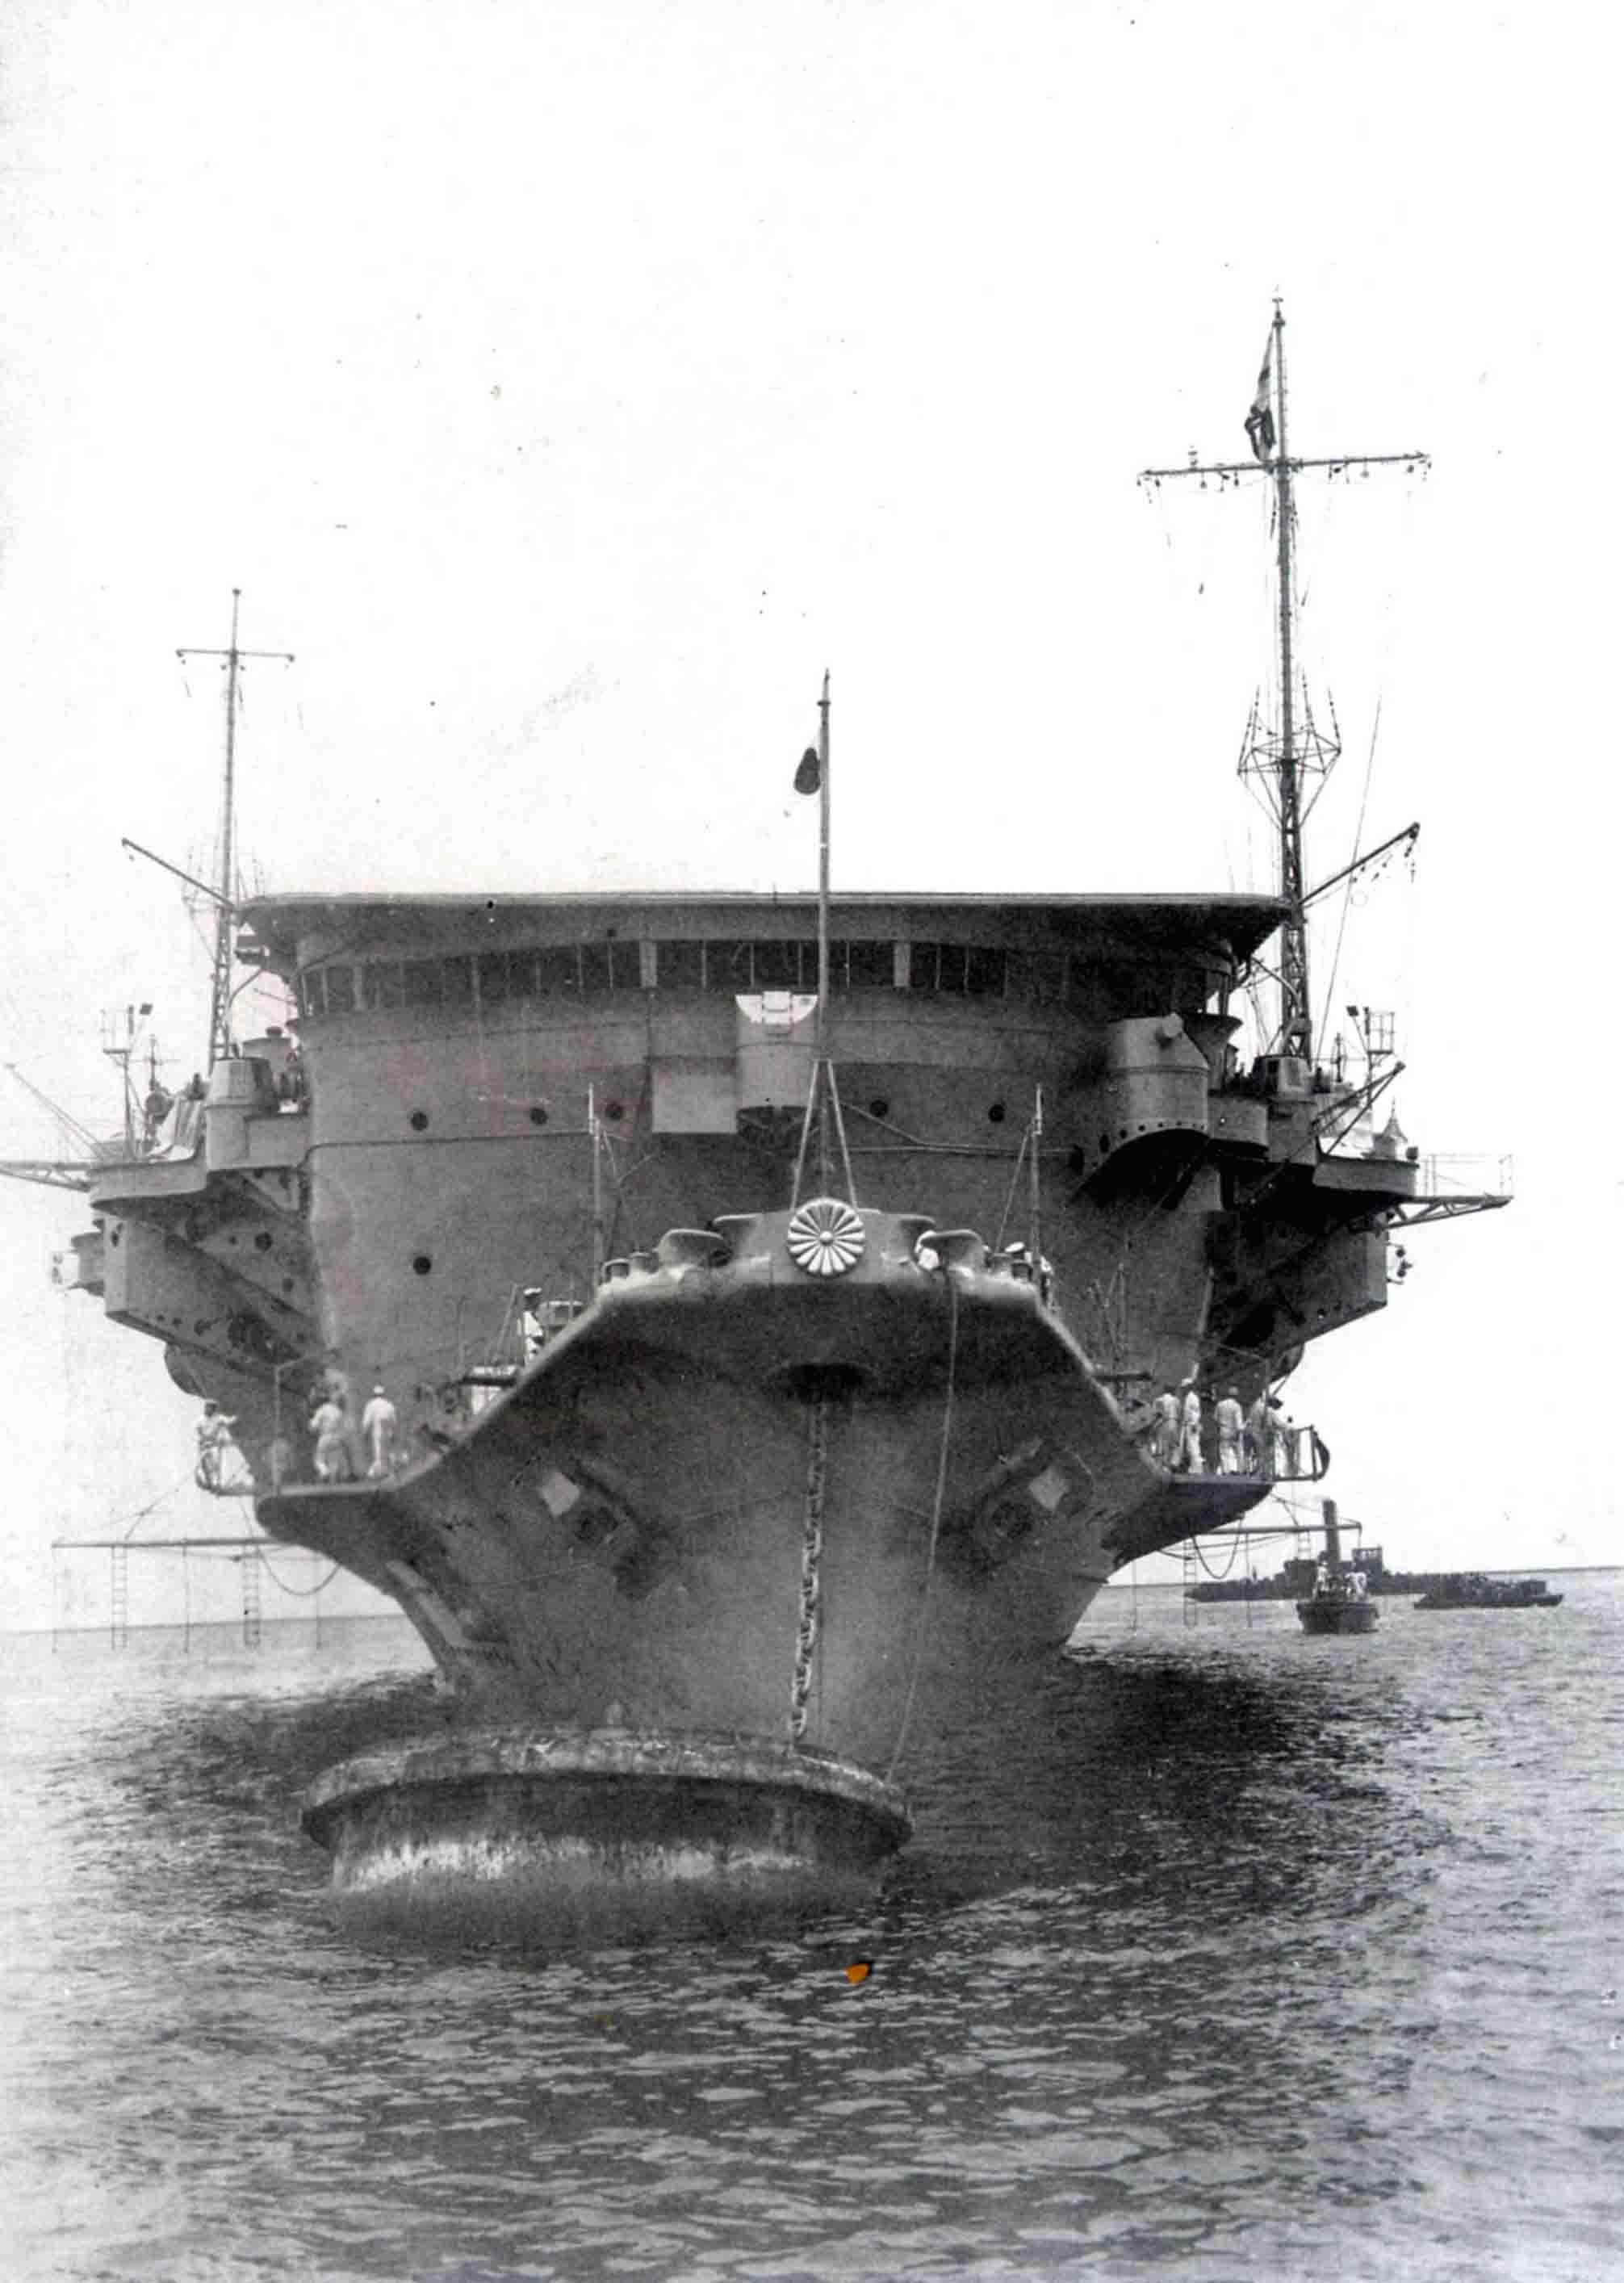 Ryujo aircraft carrier